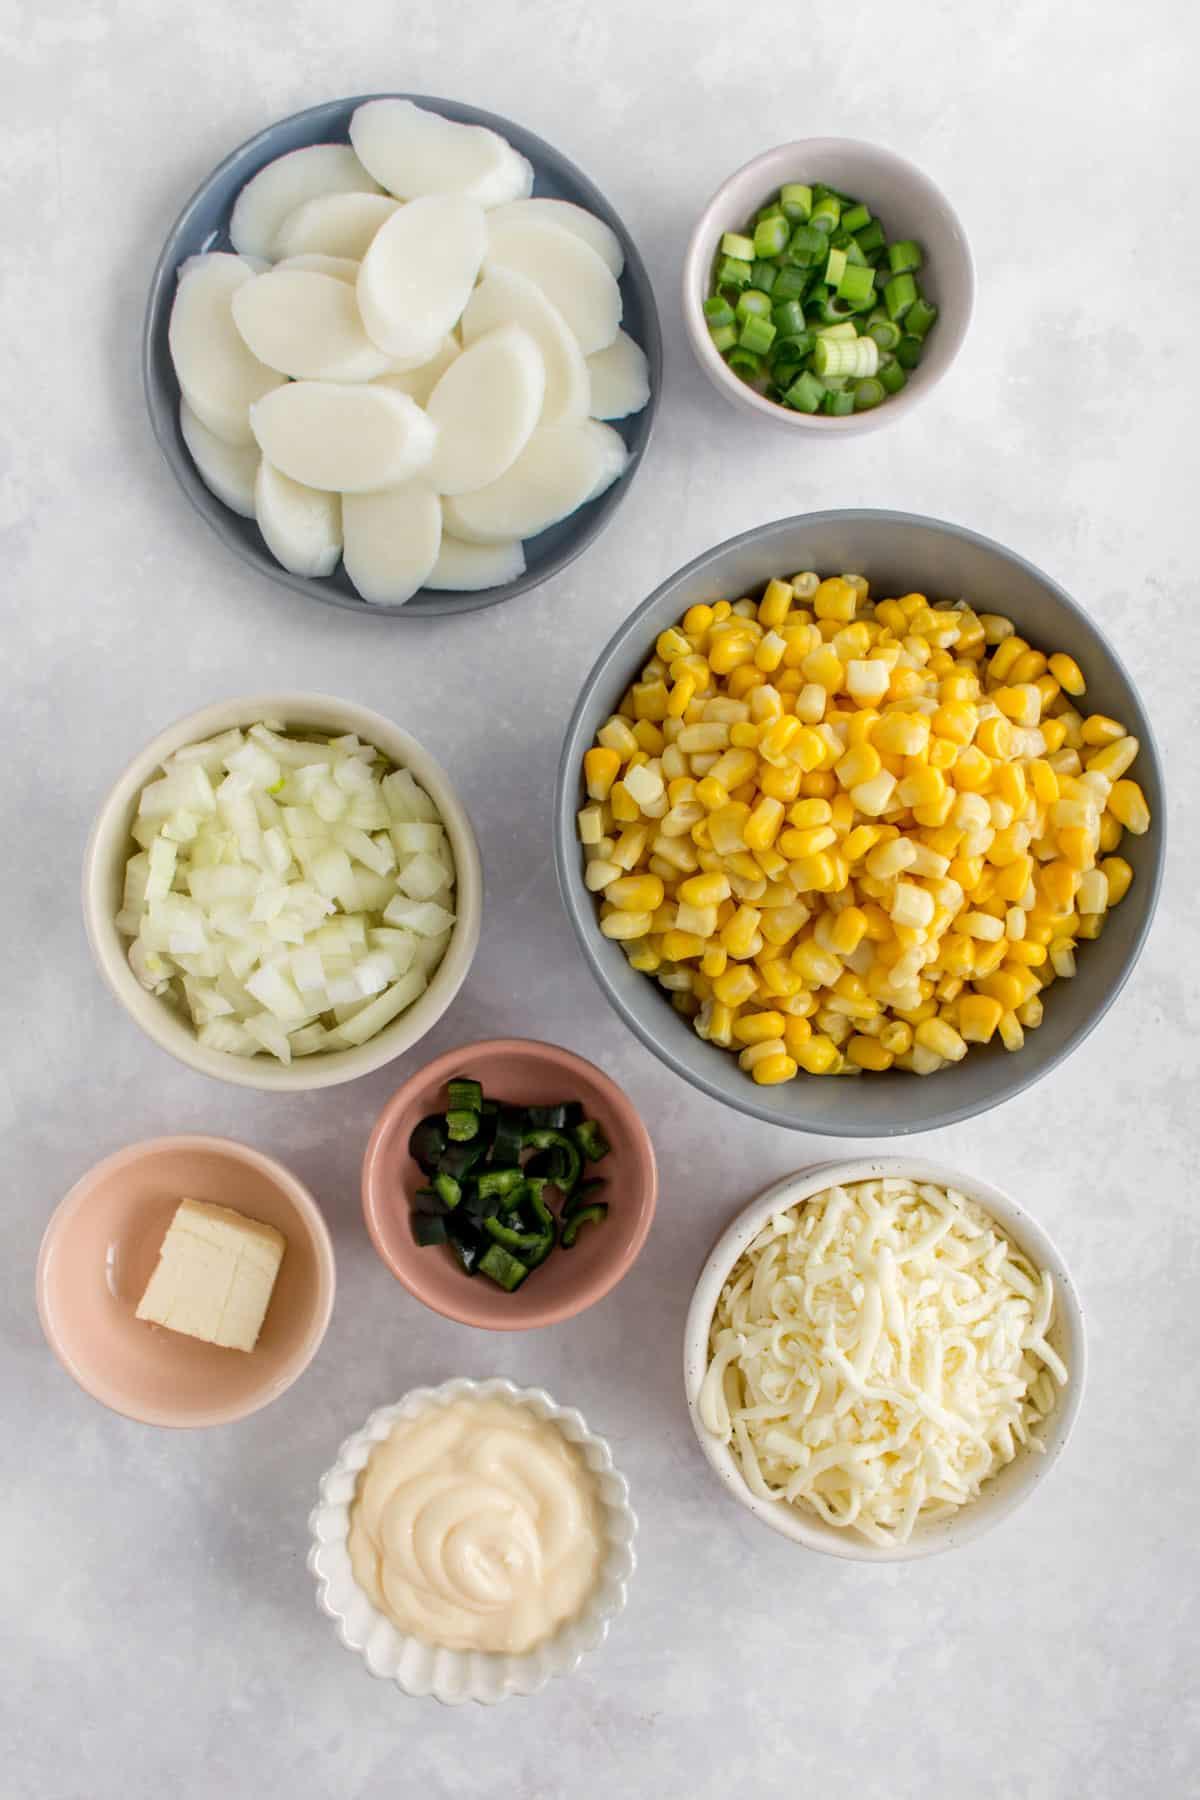 Overhead image of ingredients needed to make Korean cheese corn.